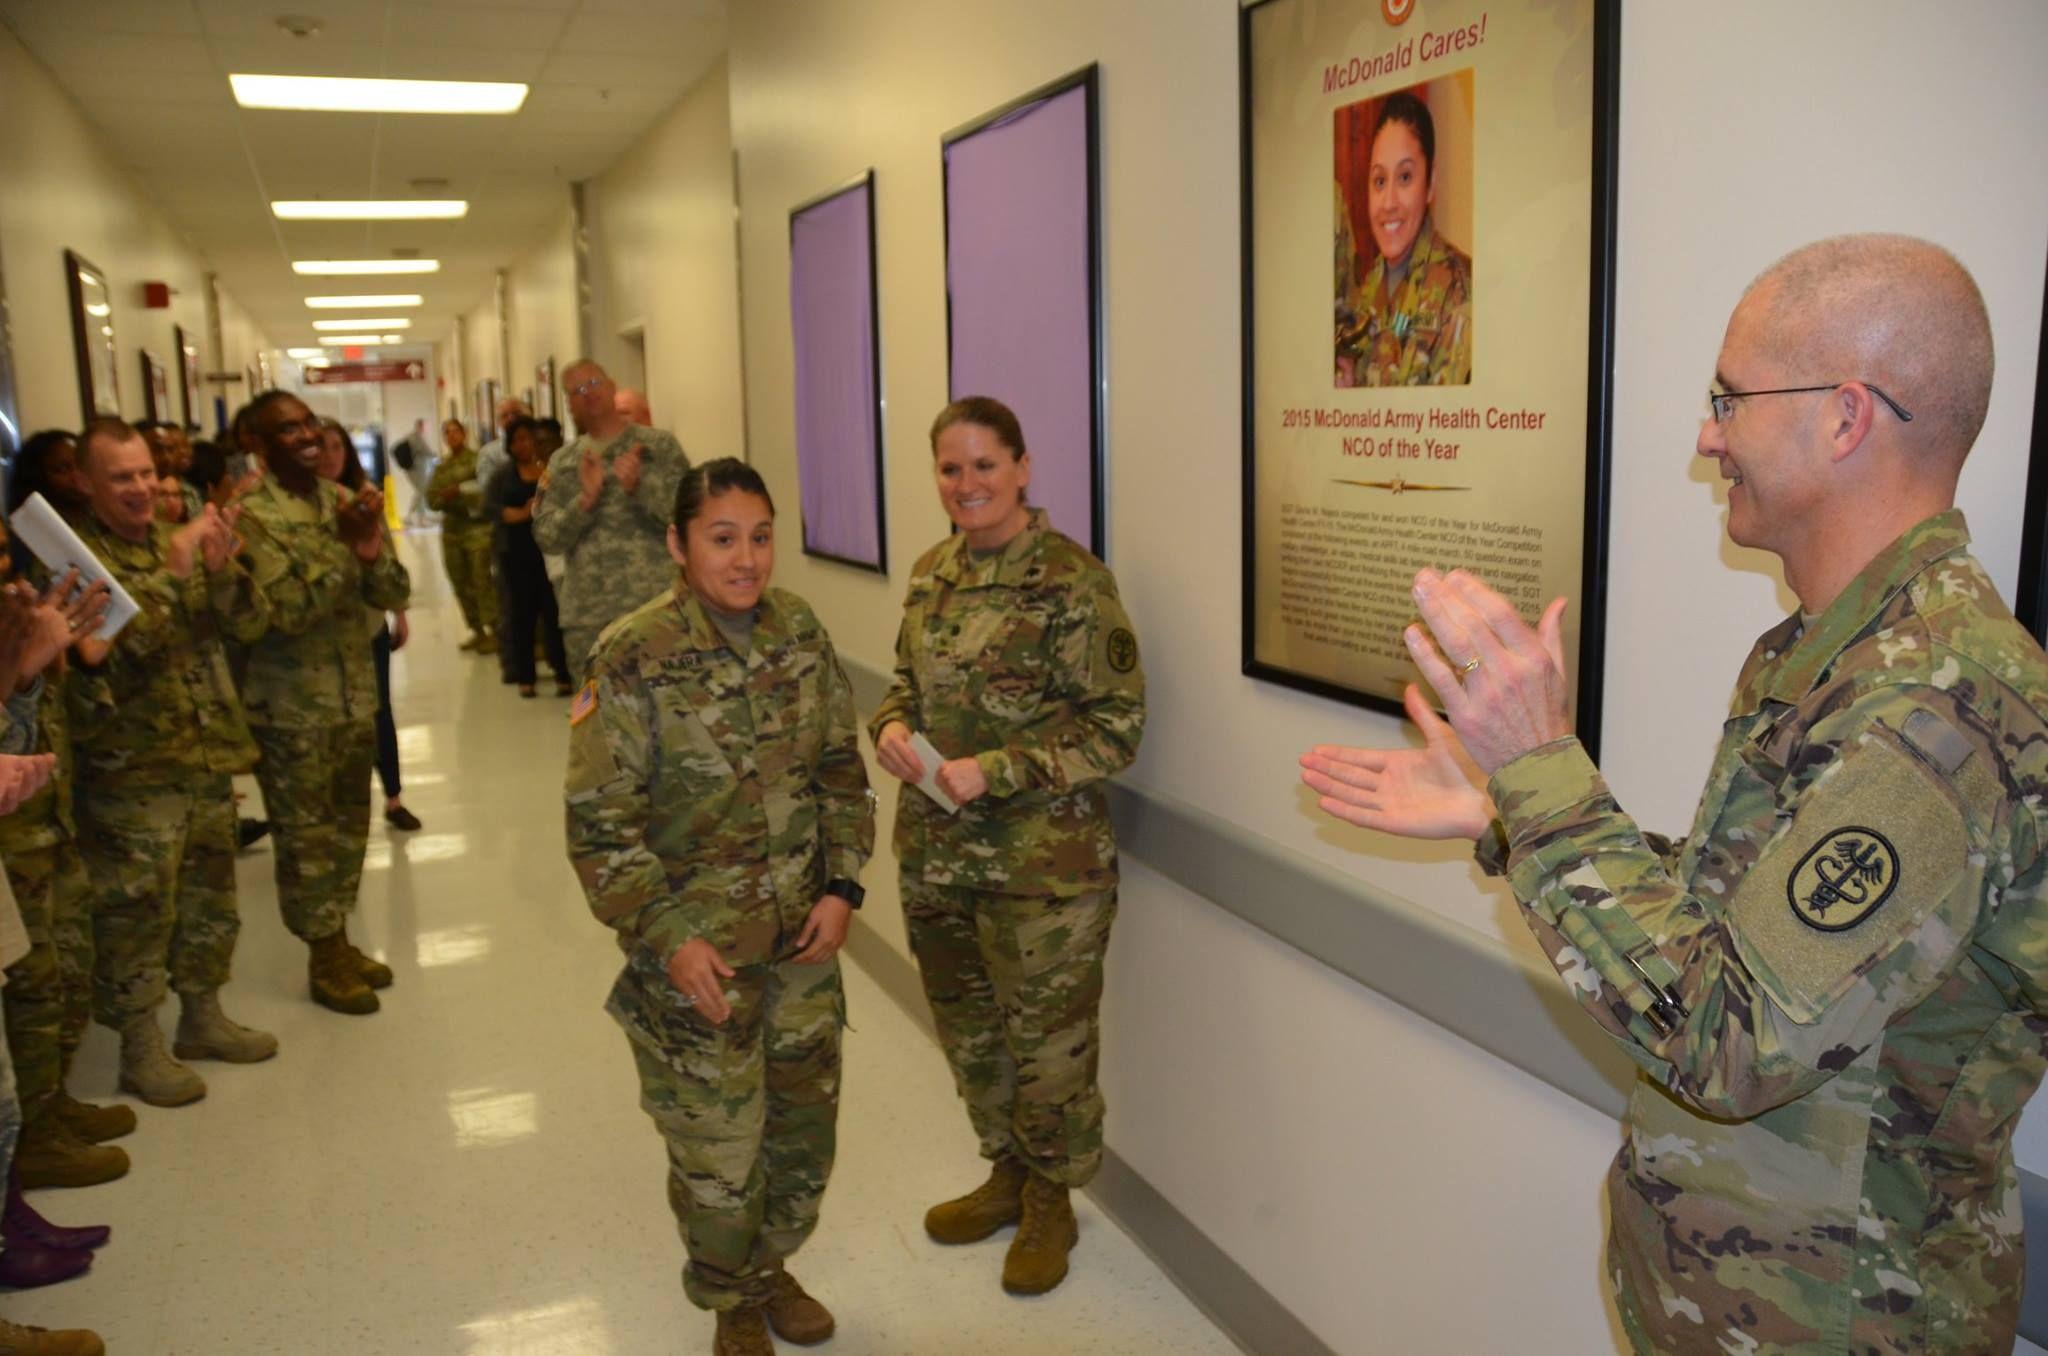 Brig gen place celebrates mcdonald army health centers